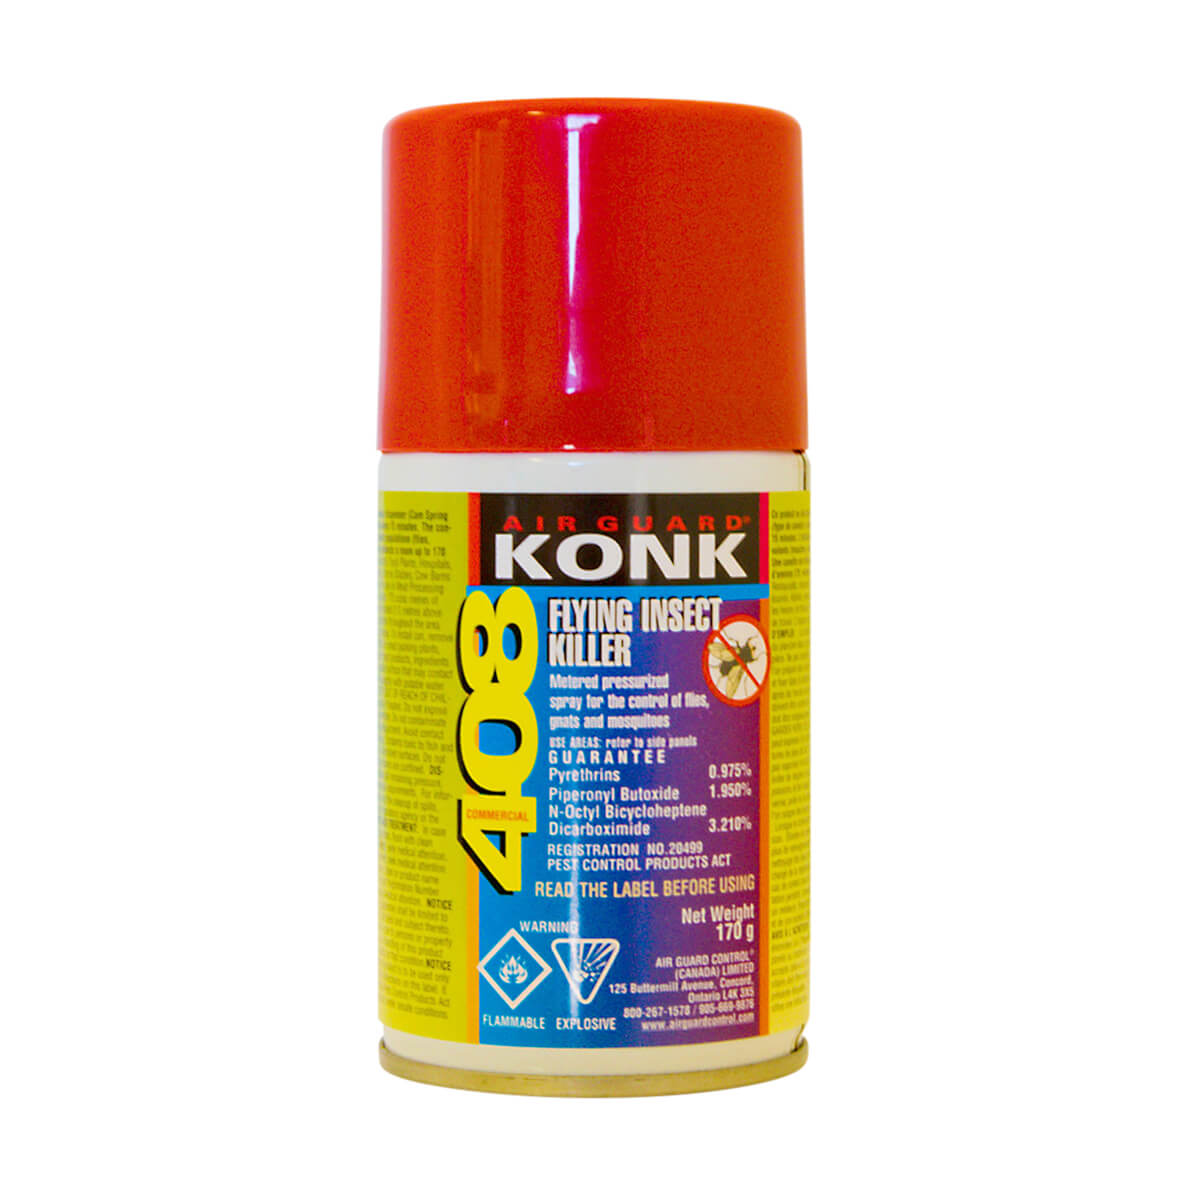 Konk 408 Flying Insect Killer 170g